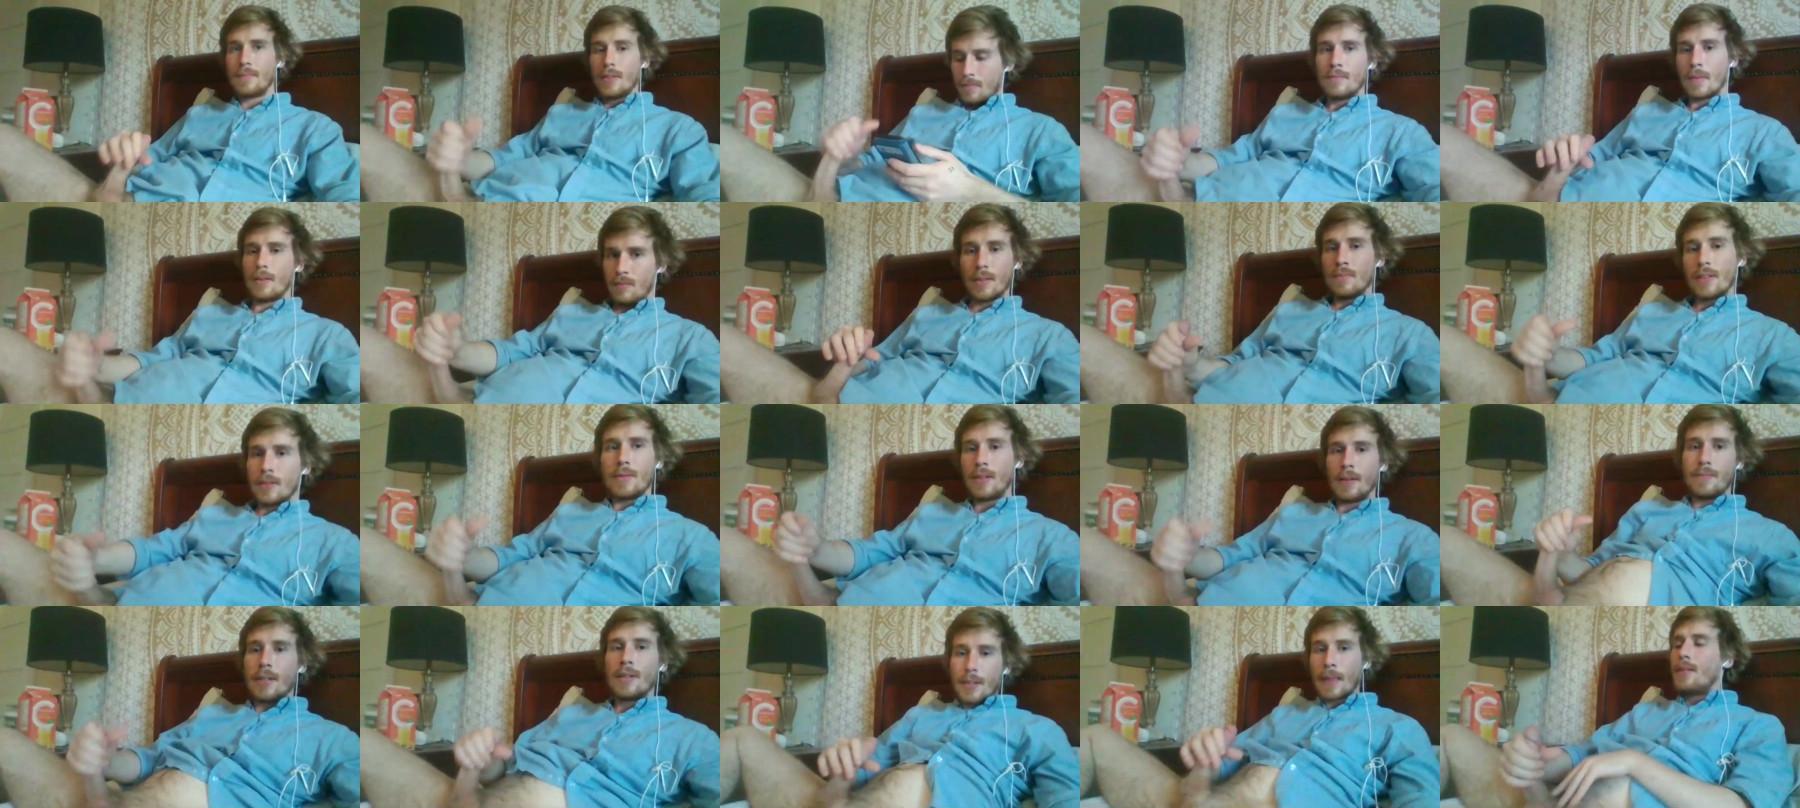 Blondesurfer1994200 Chaturbate 10-06-2021 video teasing